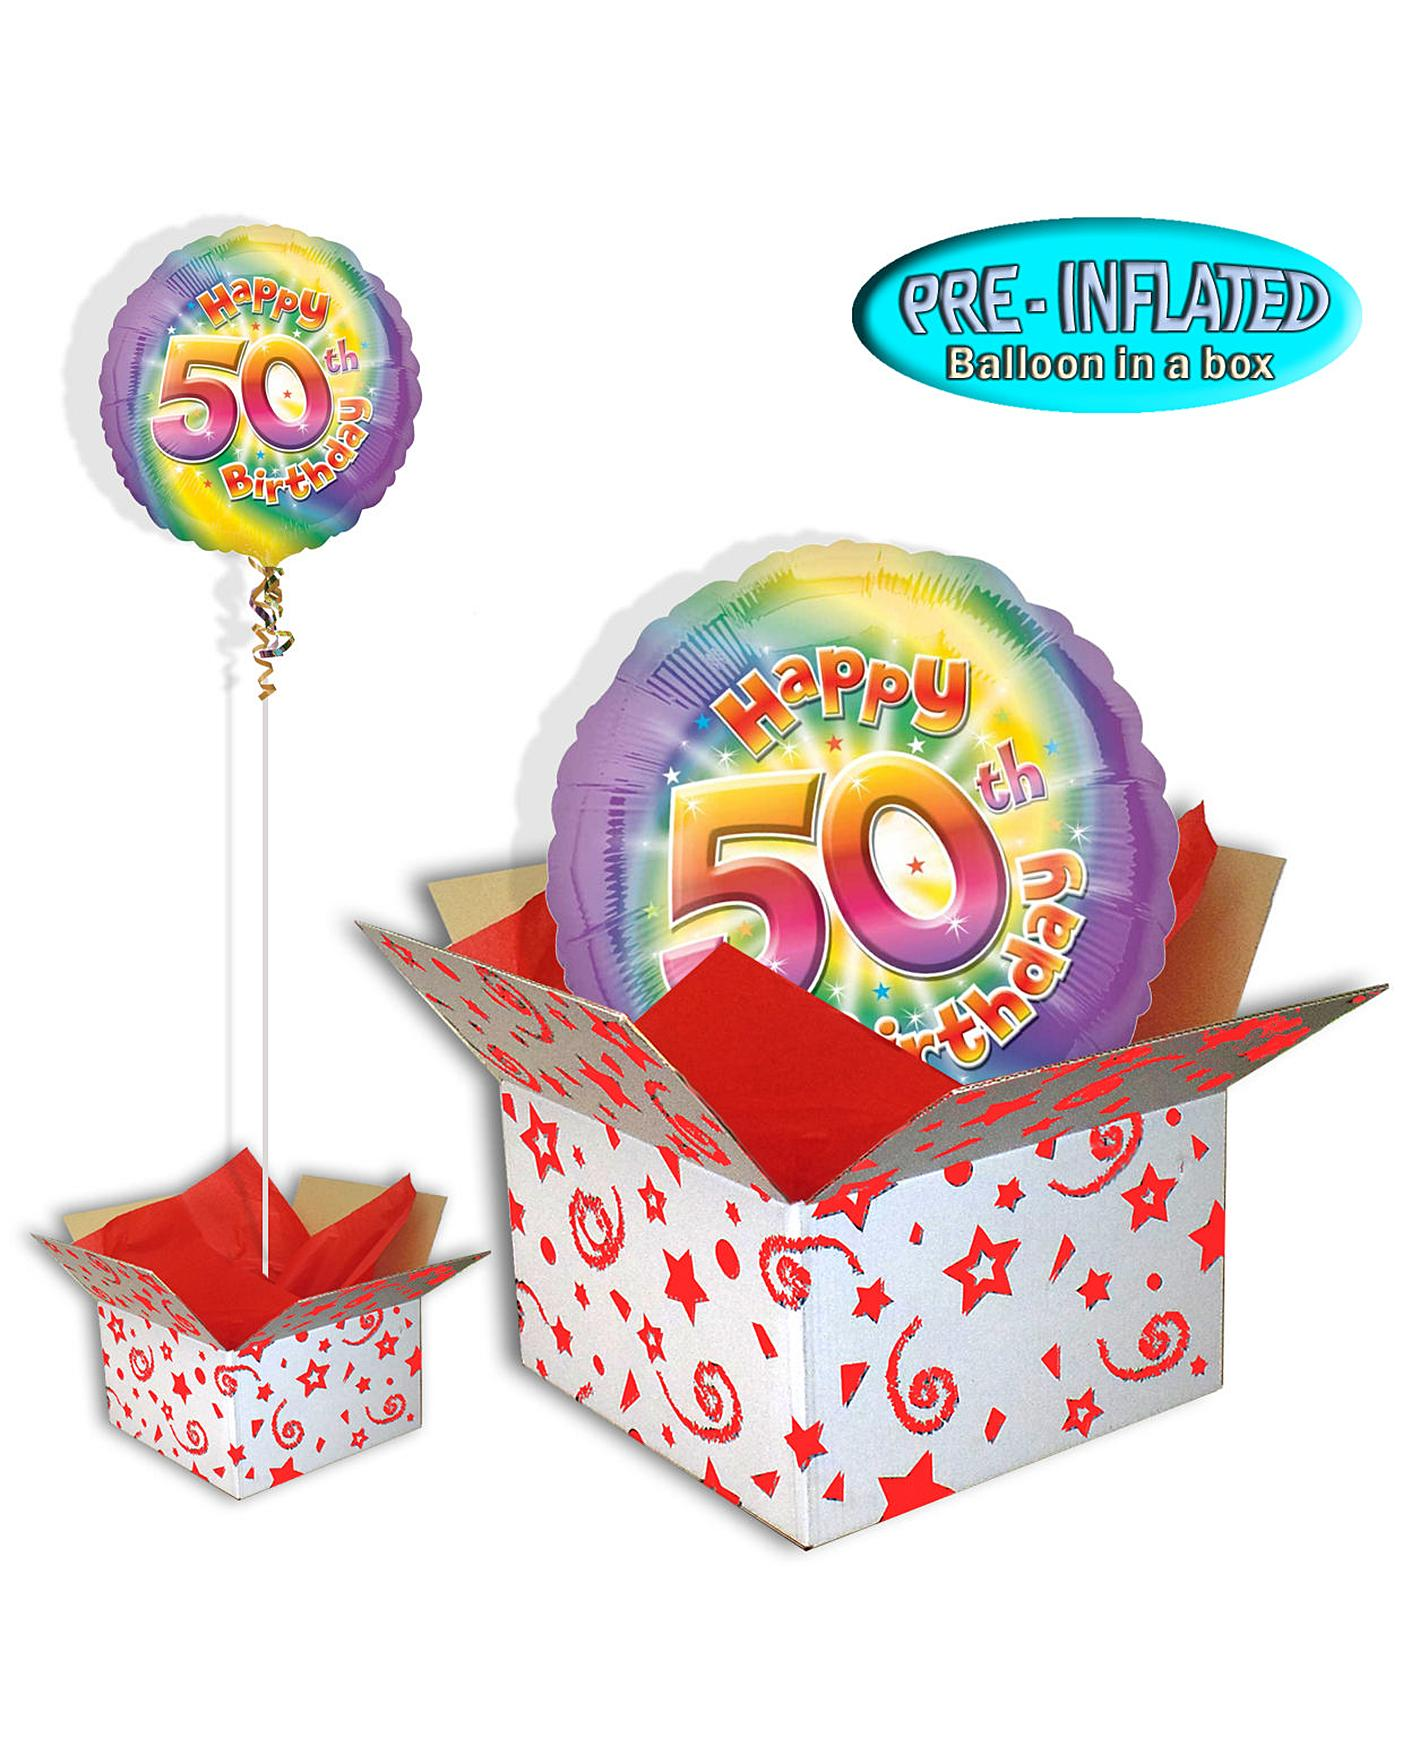 Happy 50th Birthday Balloon In A Box